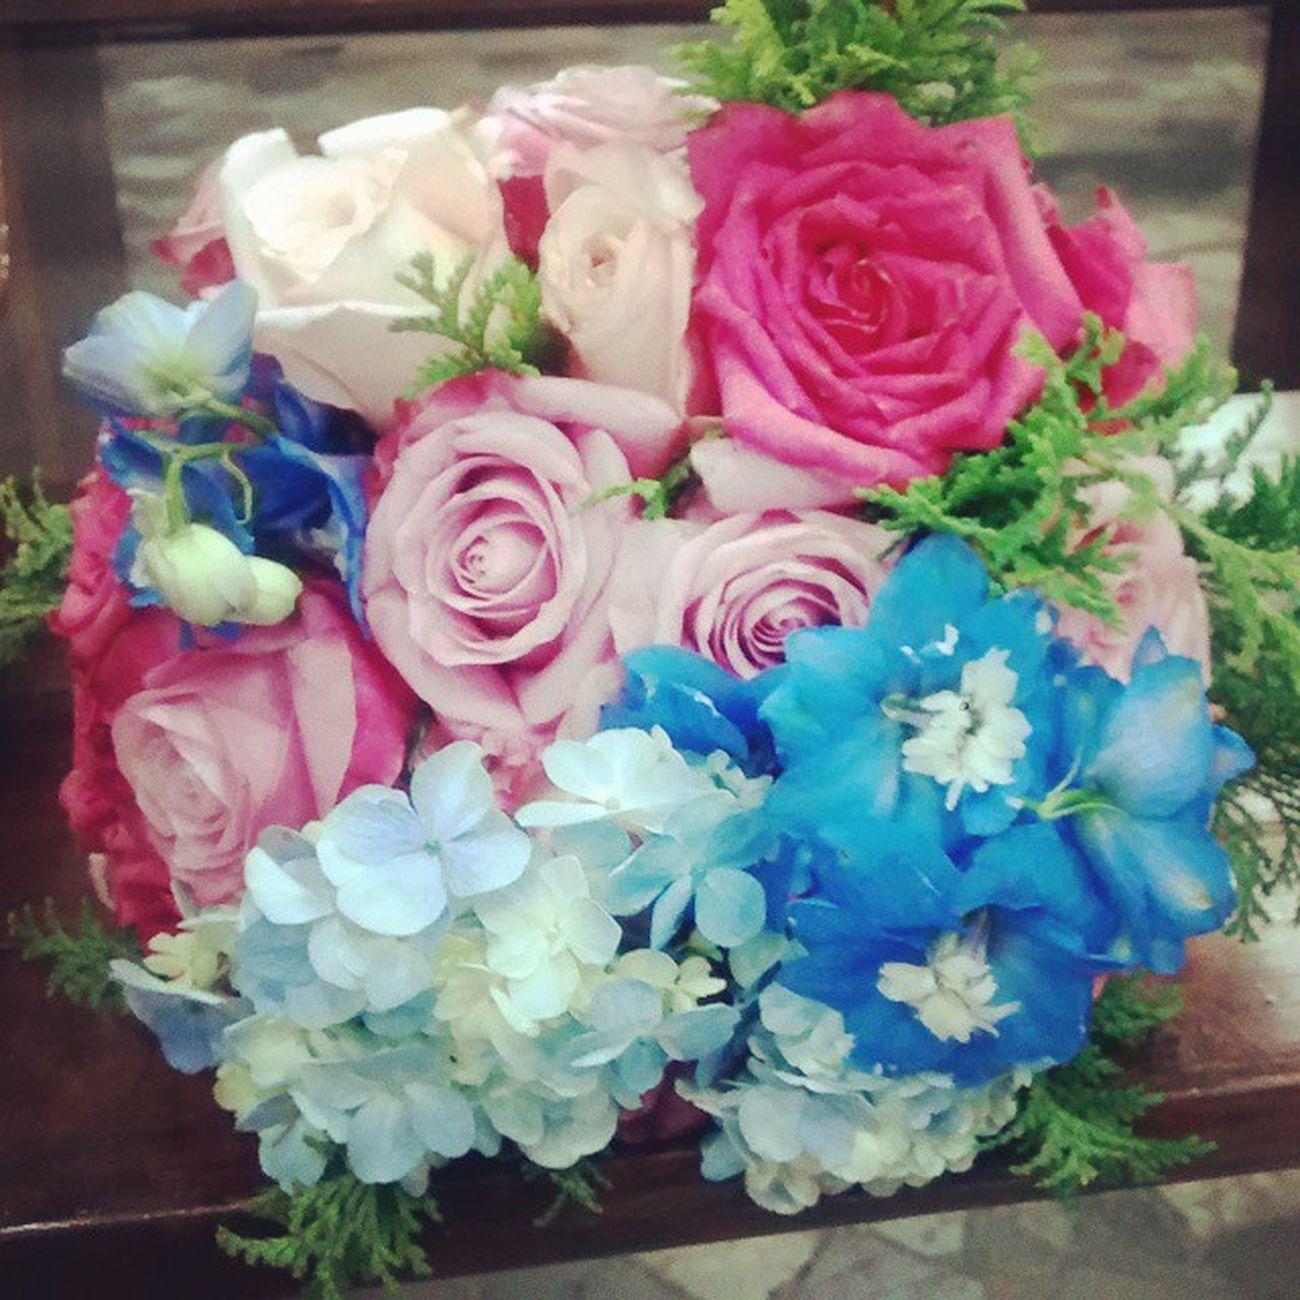 Para nossa noiva Aline, todo o Amor do mundo em forma de flor! Felicidades ao casal! Decoracaopersonalizada Decoracaodefestas Decoracaodecerimonia Decoracaodecasamento Bouquetdenoiva Arranjodeflores Casamentorosaeazul